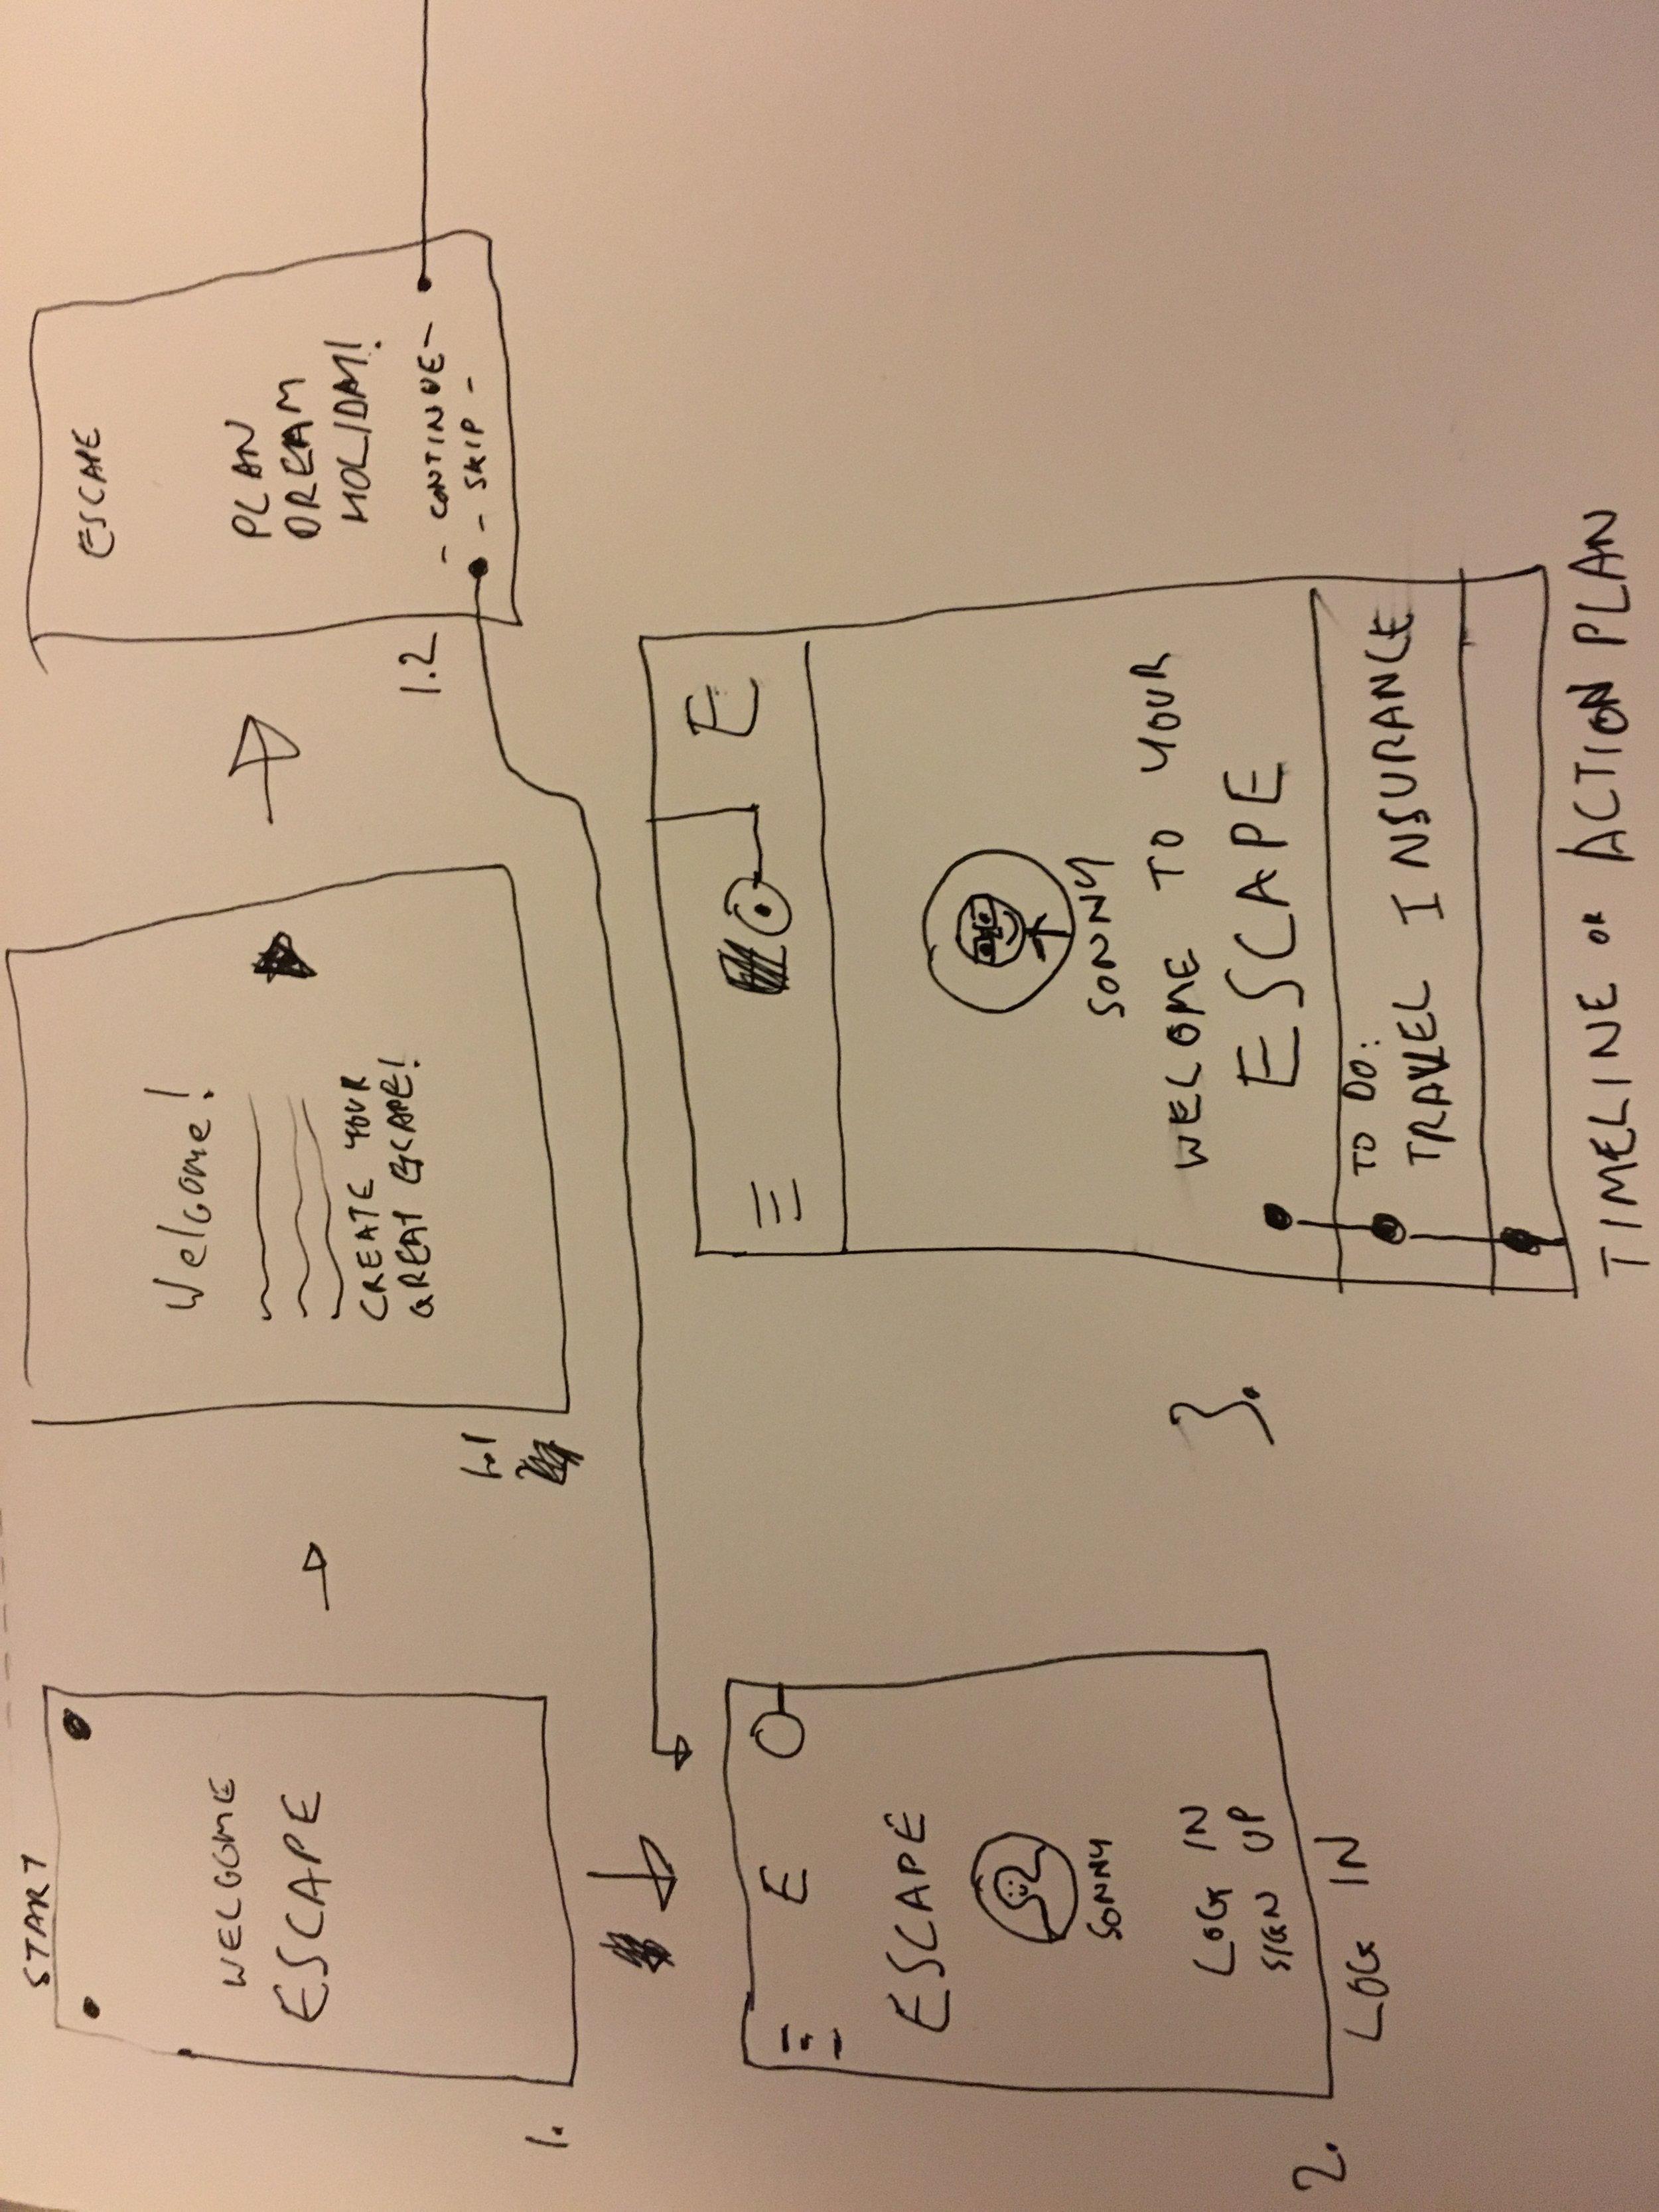 ESCAPE_Sketches p1.JPG